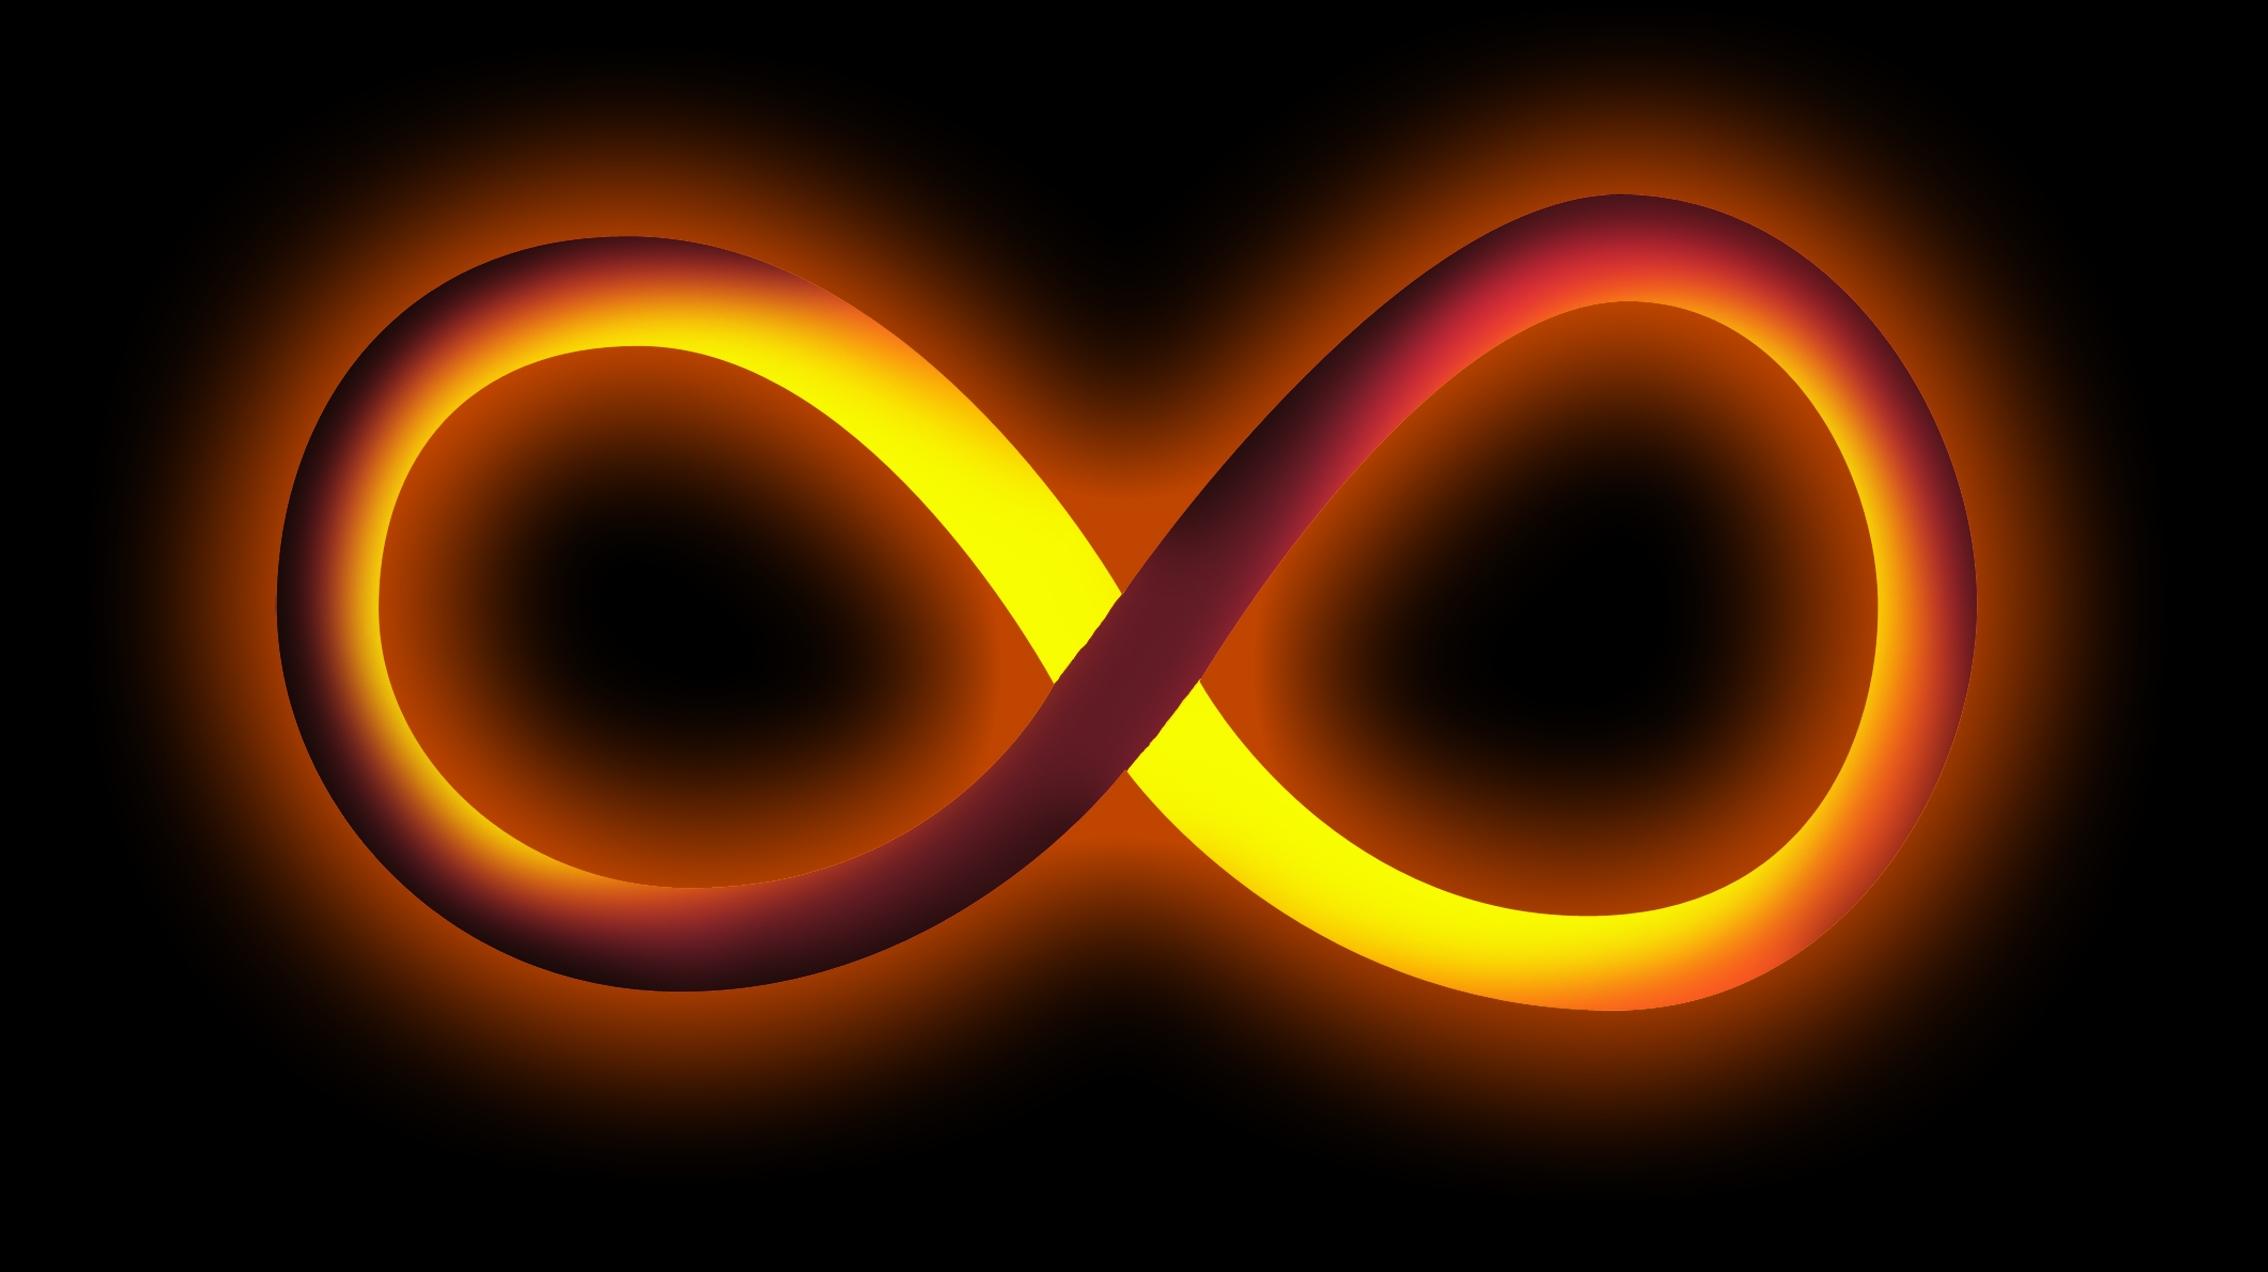 Infinity symbol (wikia.com)